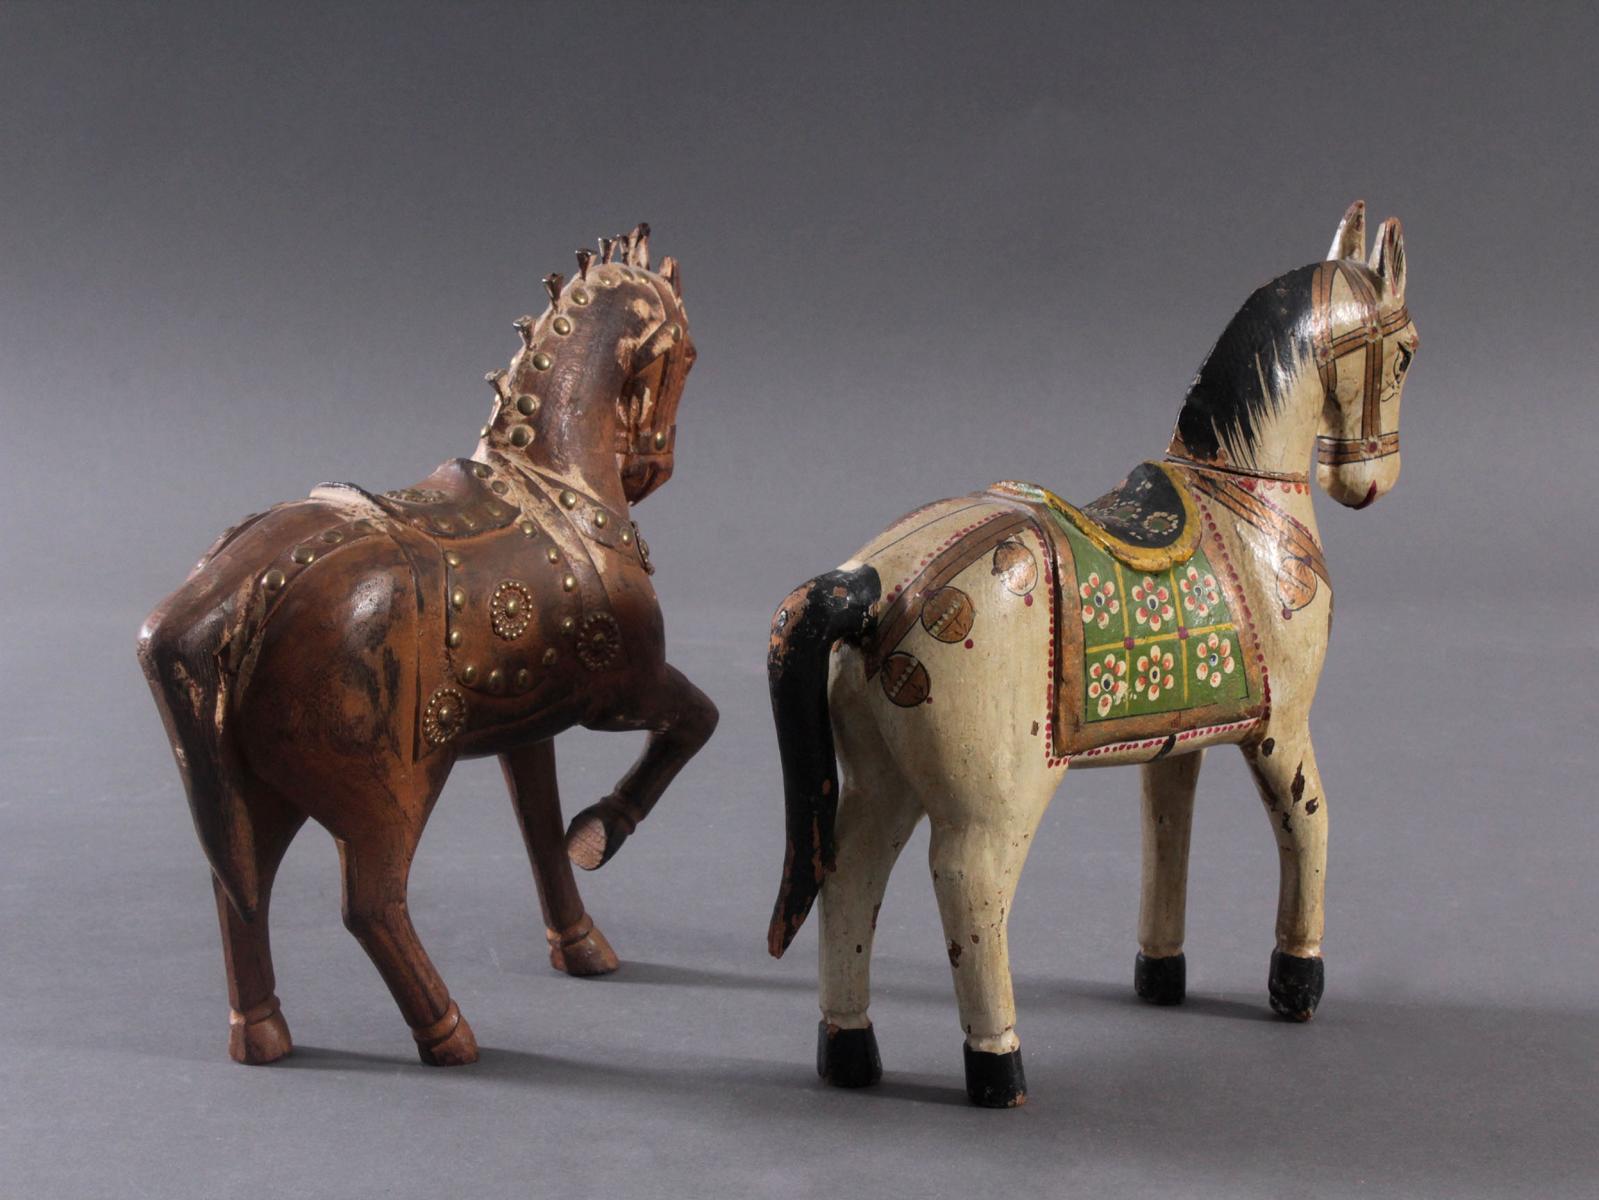 2 Pferdeskulpturen aus Holz 1. Hälfte 20. Jh.-3